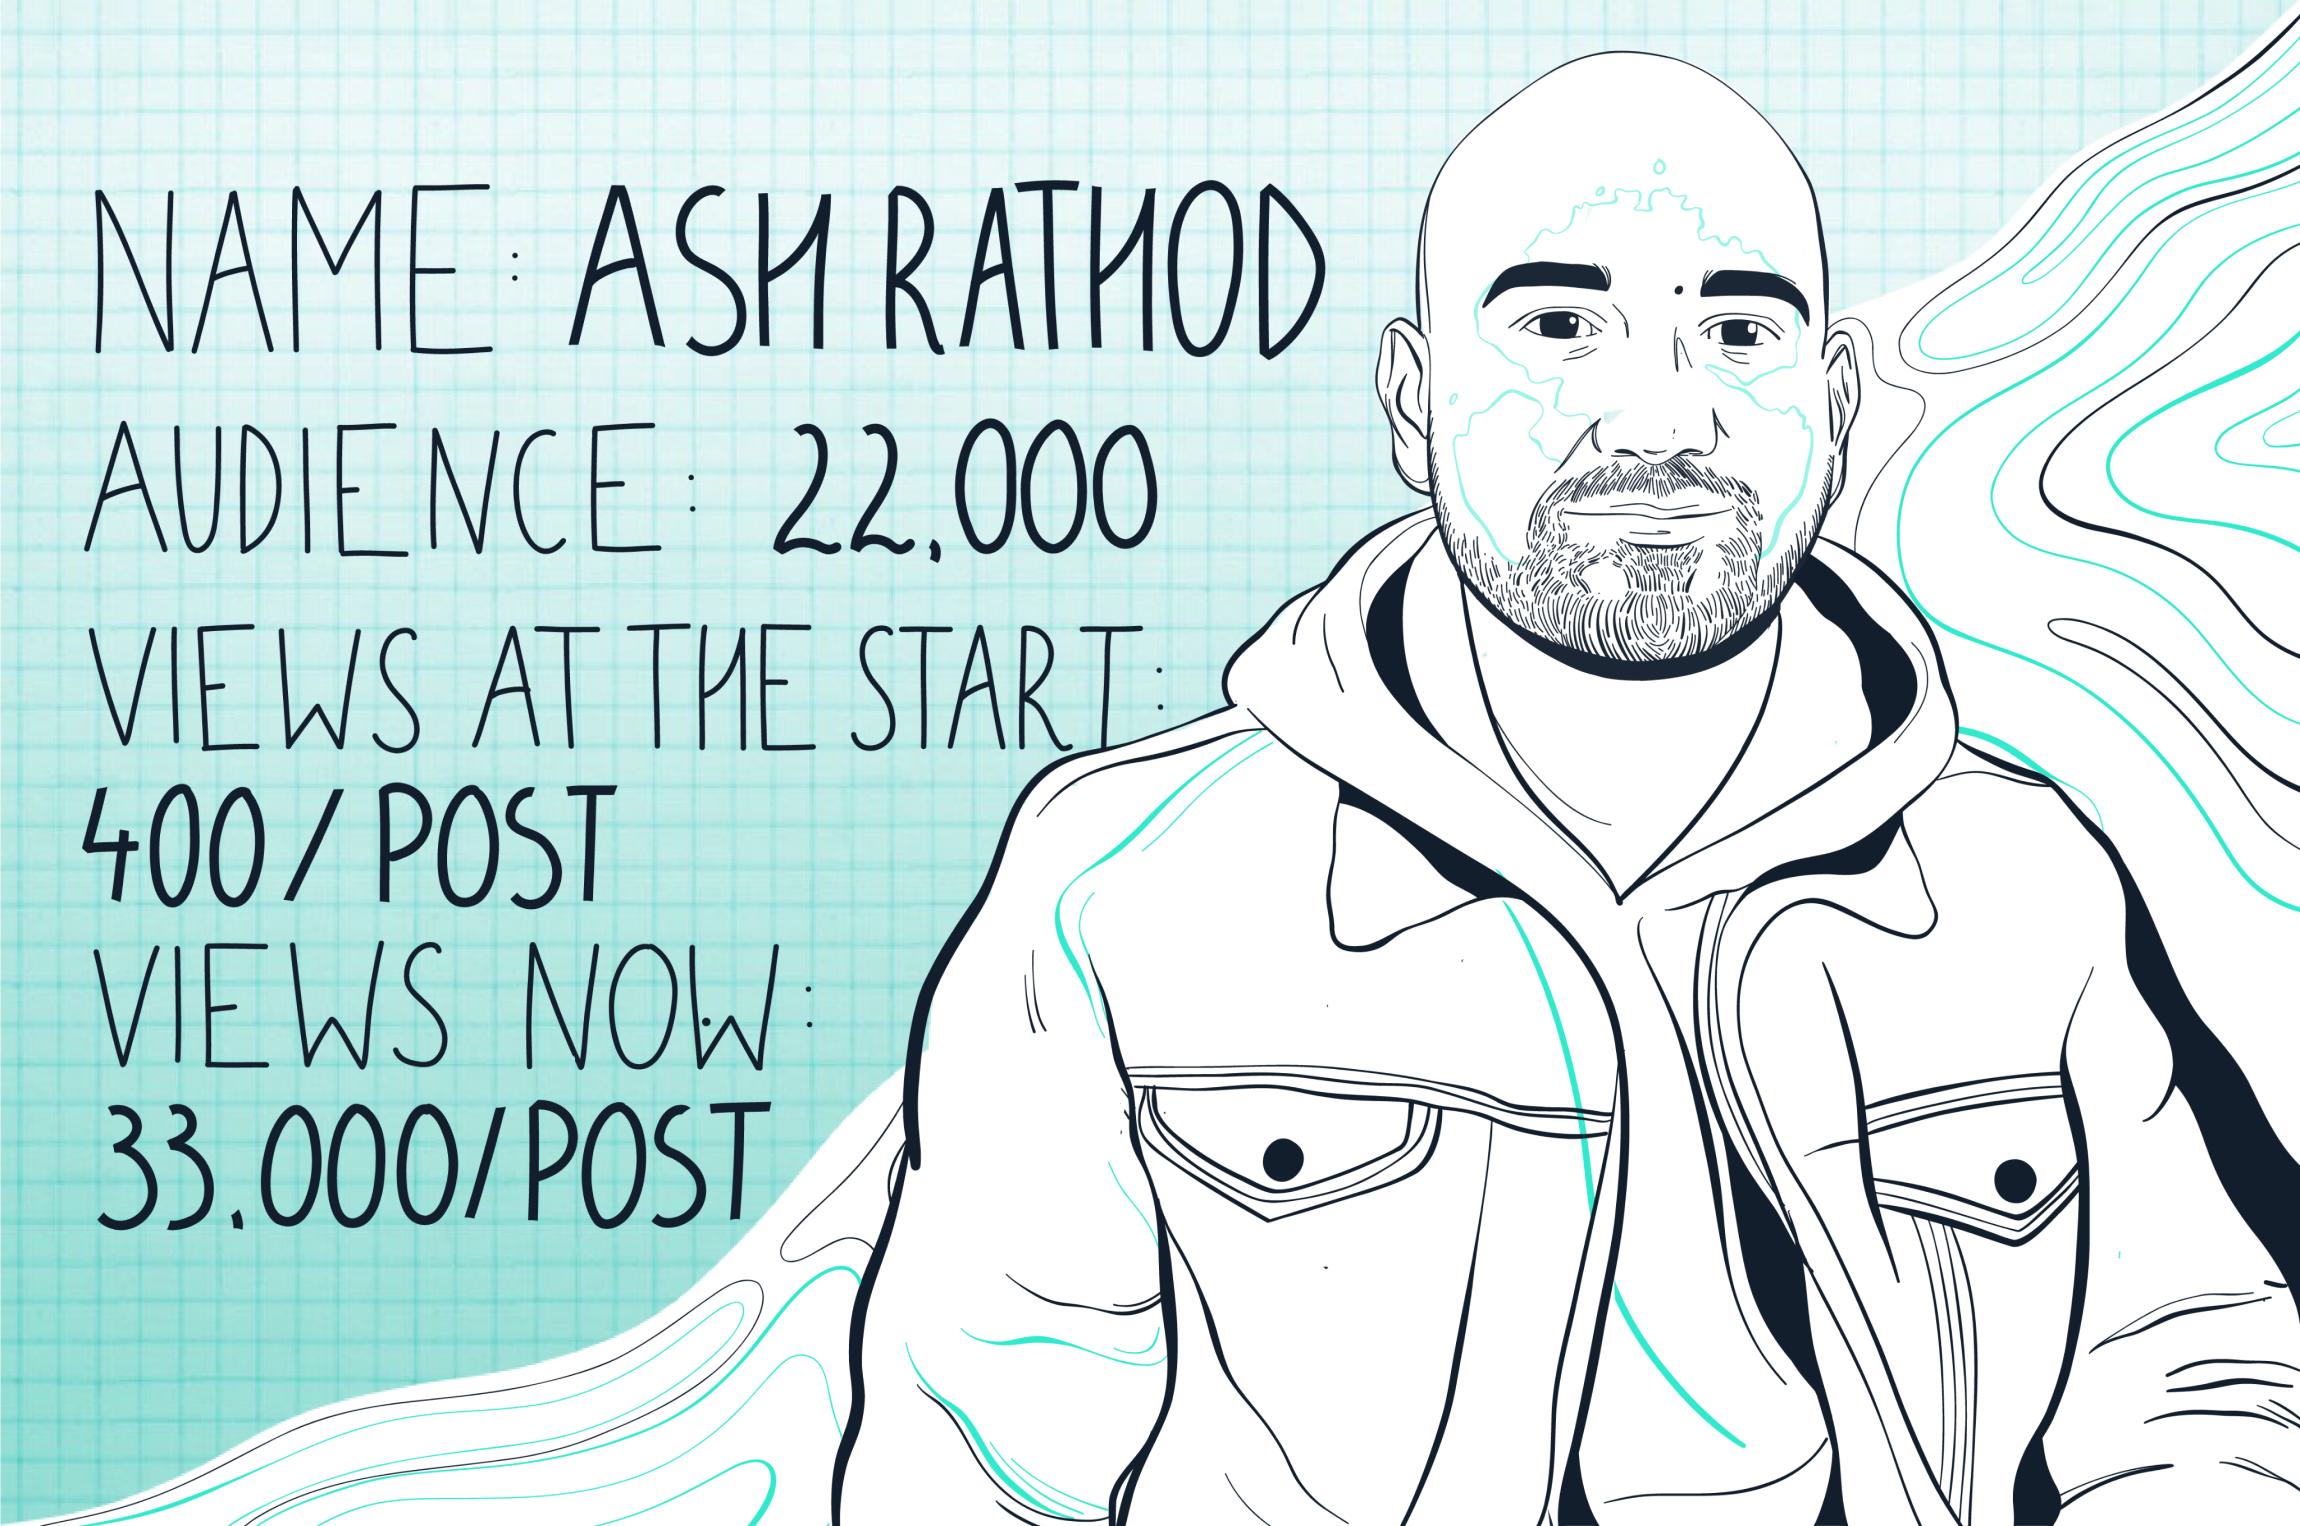 Storytelling on LinkedIn with Ash Rathod